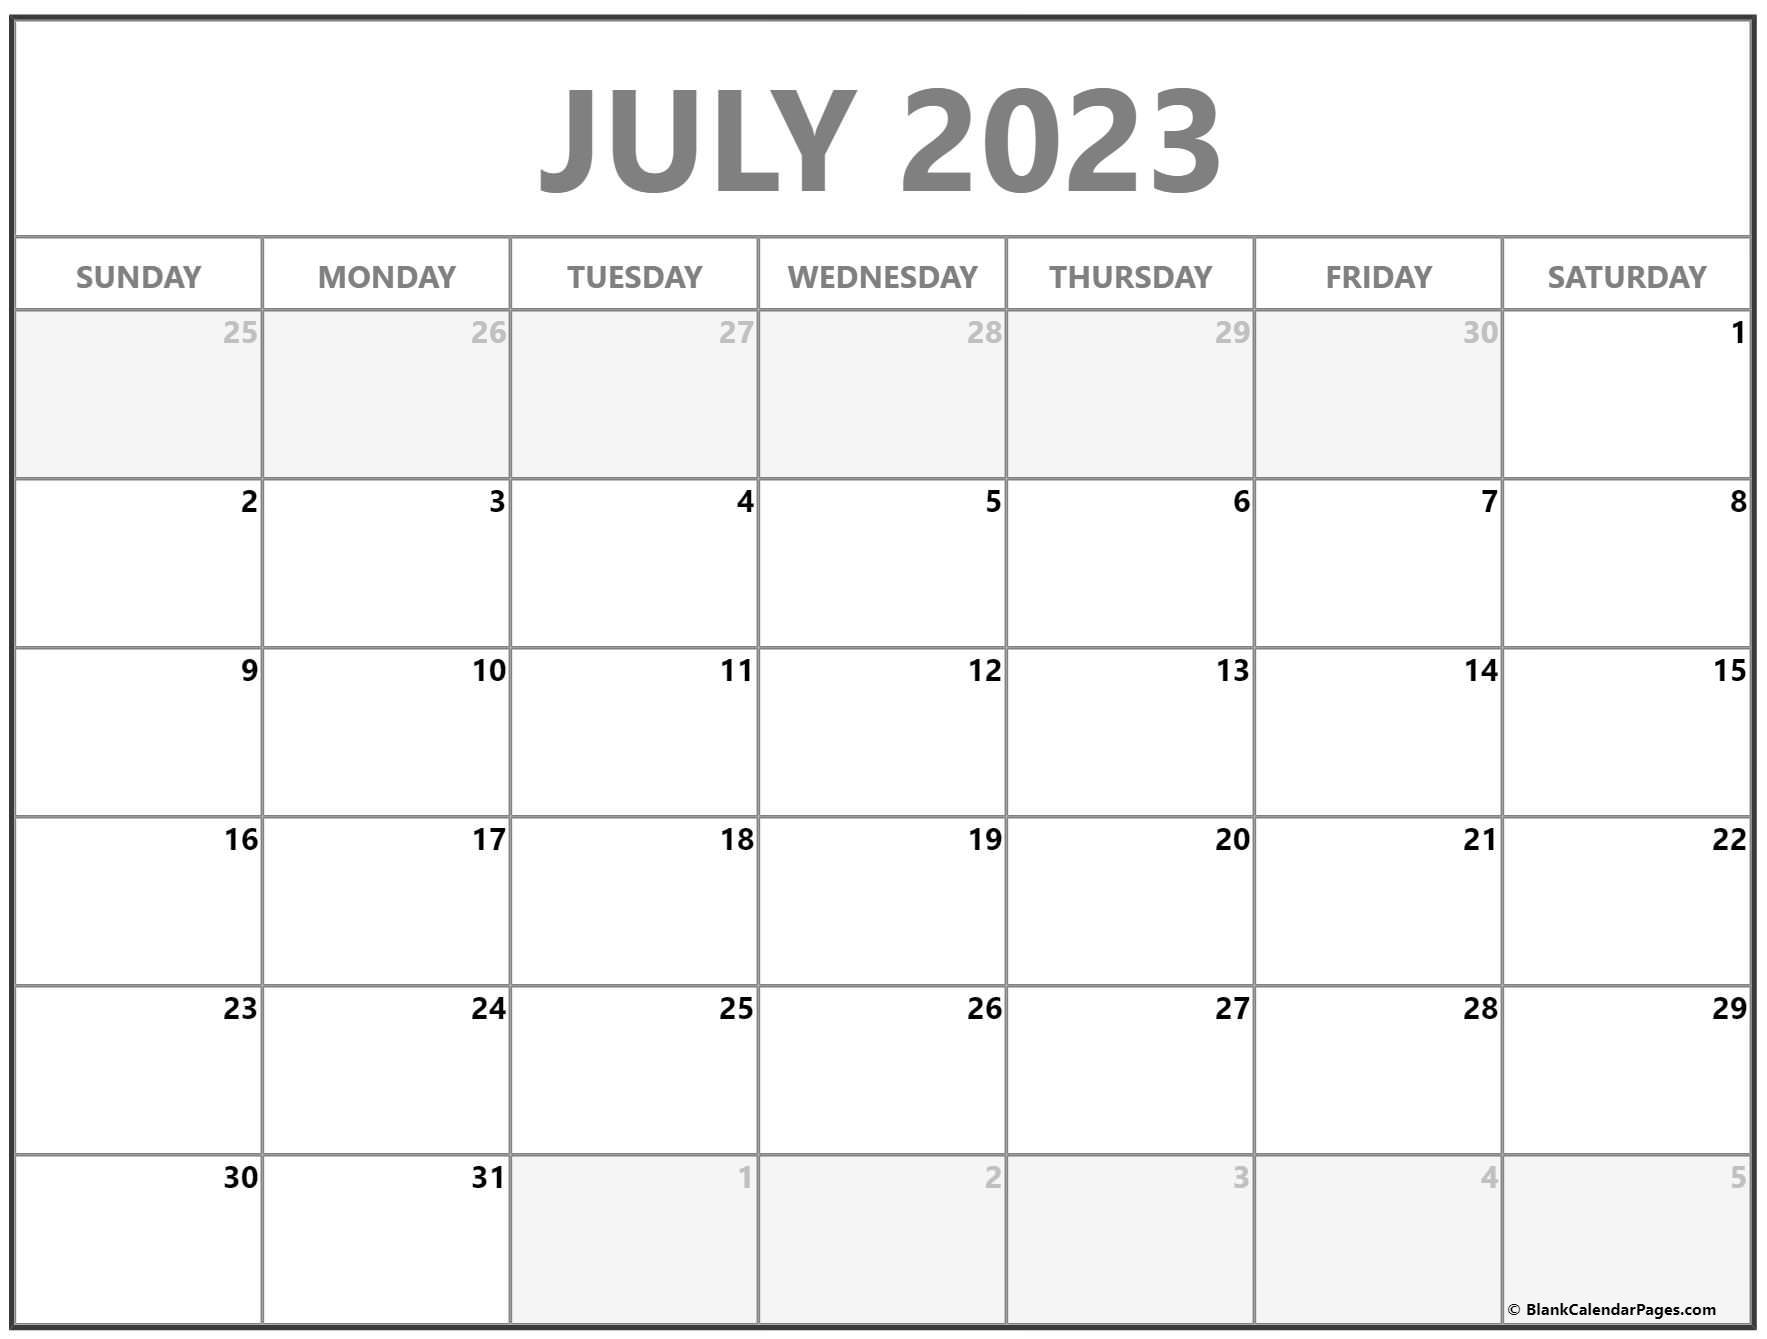 July 2022 calendar | free printable calendar templates